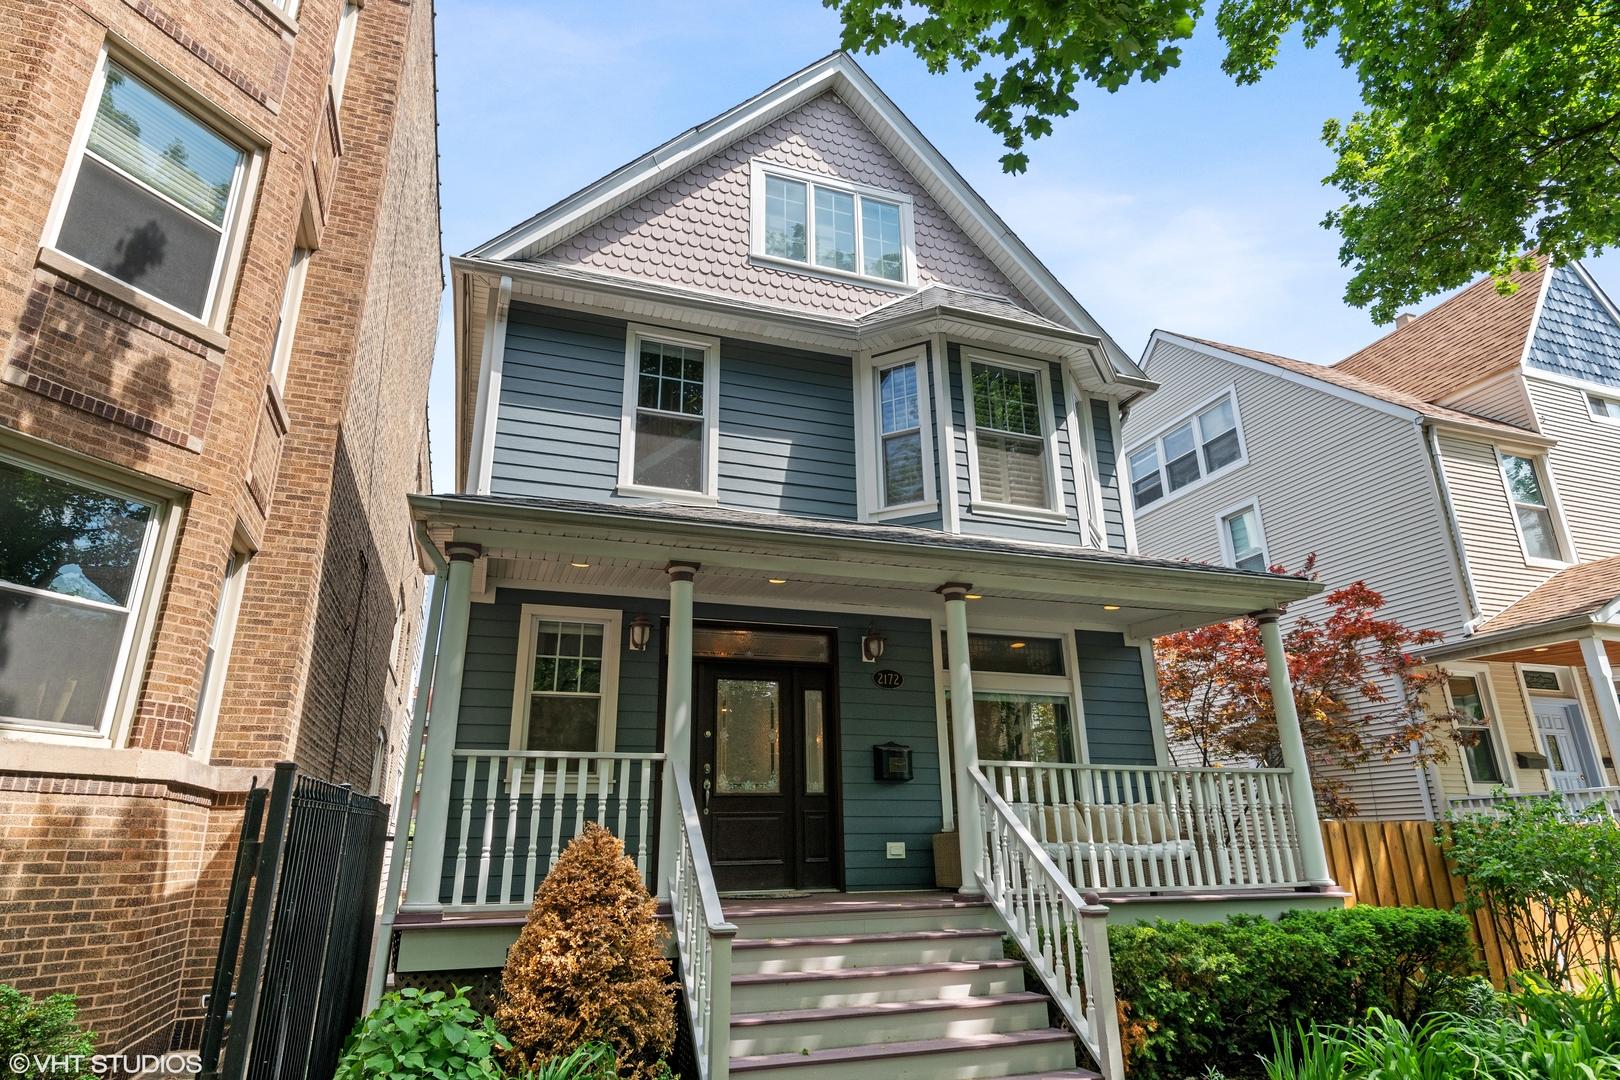 2172 Giddings Street, Chicago, Illinois 60625, 5 Bedrooms Bedrooms, ,3 BathroomsBathrooms,Residential,For Sale,Giddings,MRD11100127